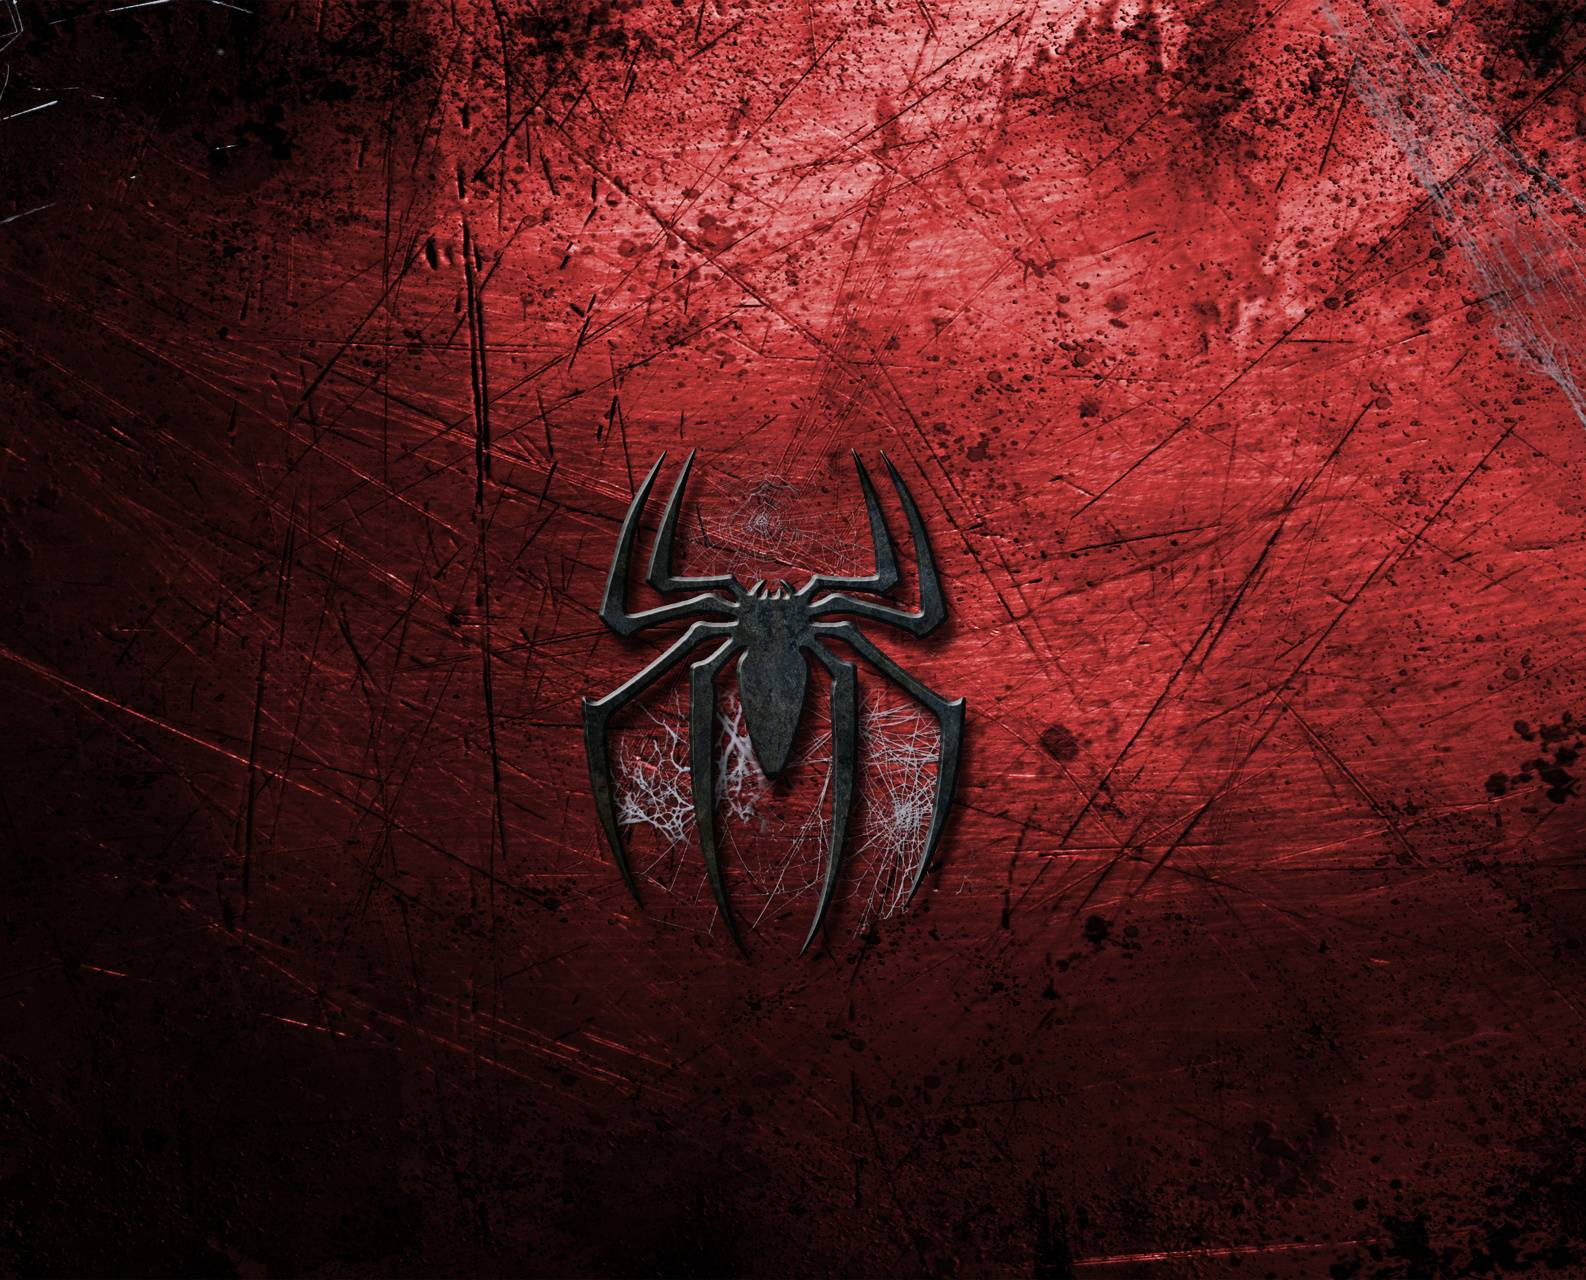 spiderman 4 logo